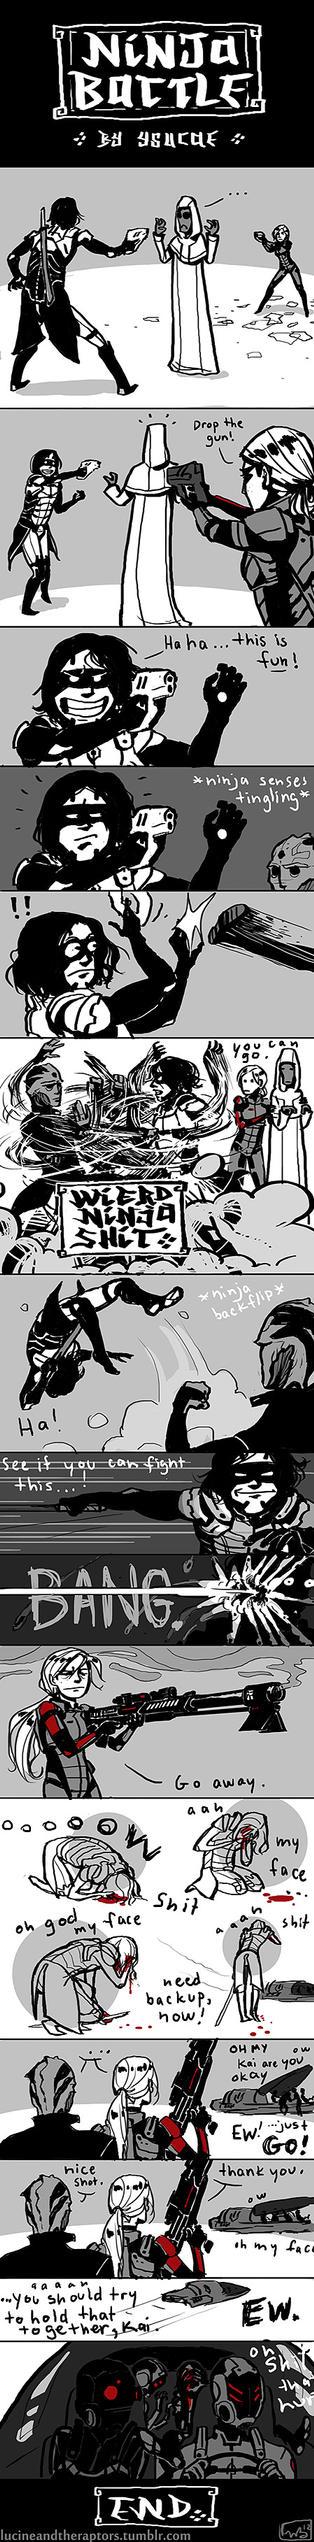 Ninja Battle by ysucae